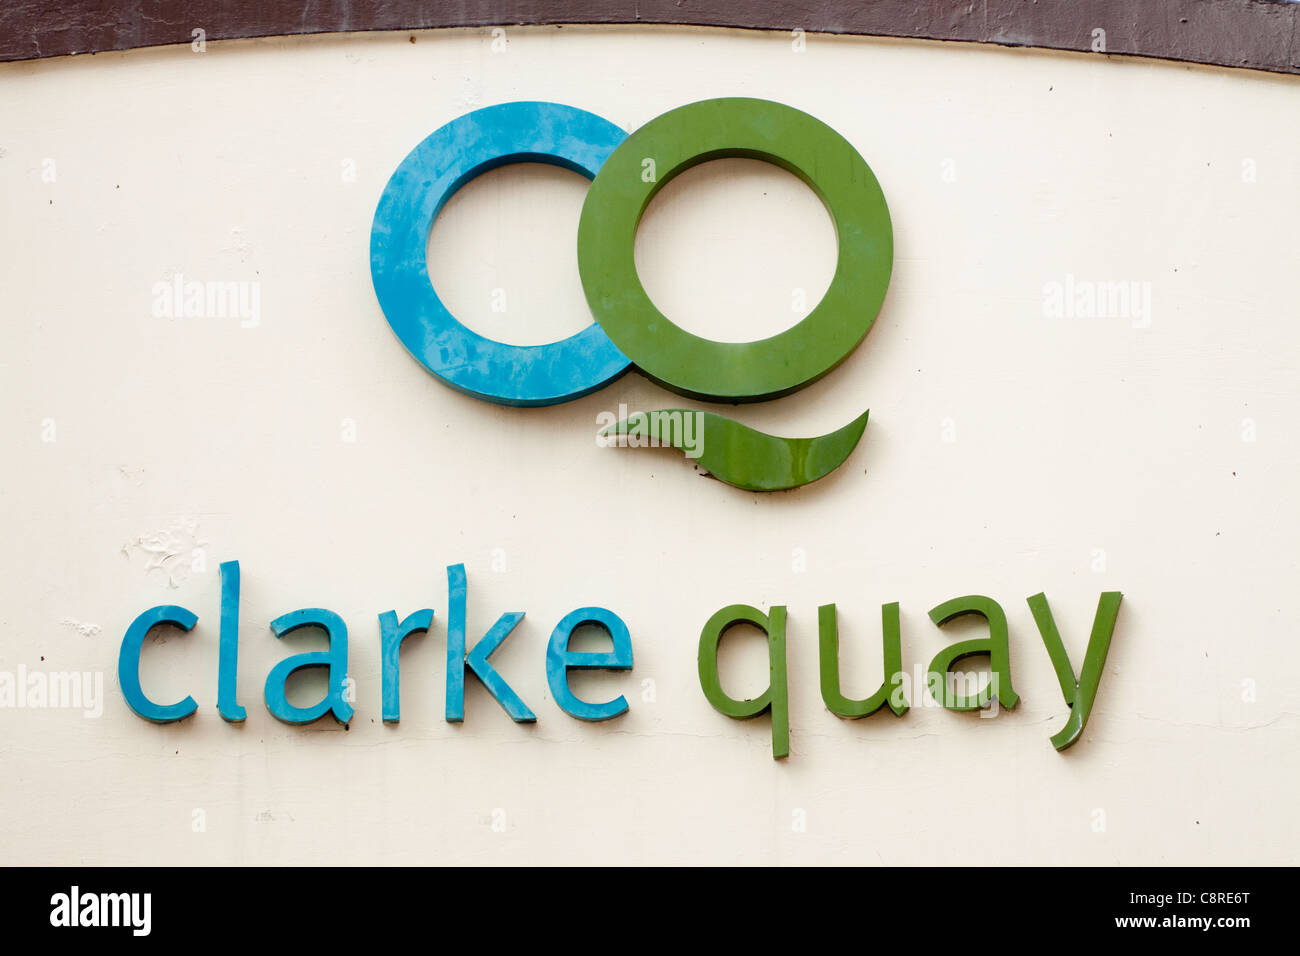 Clarke Quay sign, Singapore - Stock Image